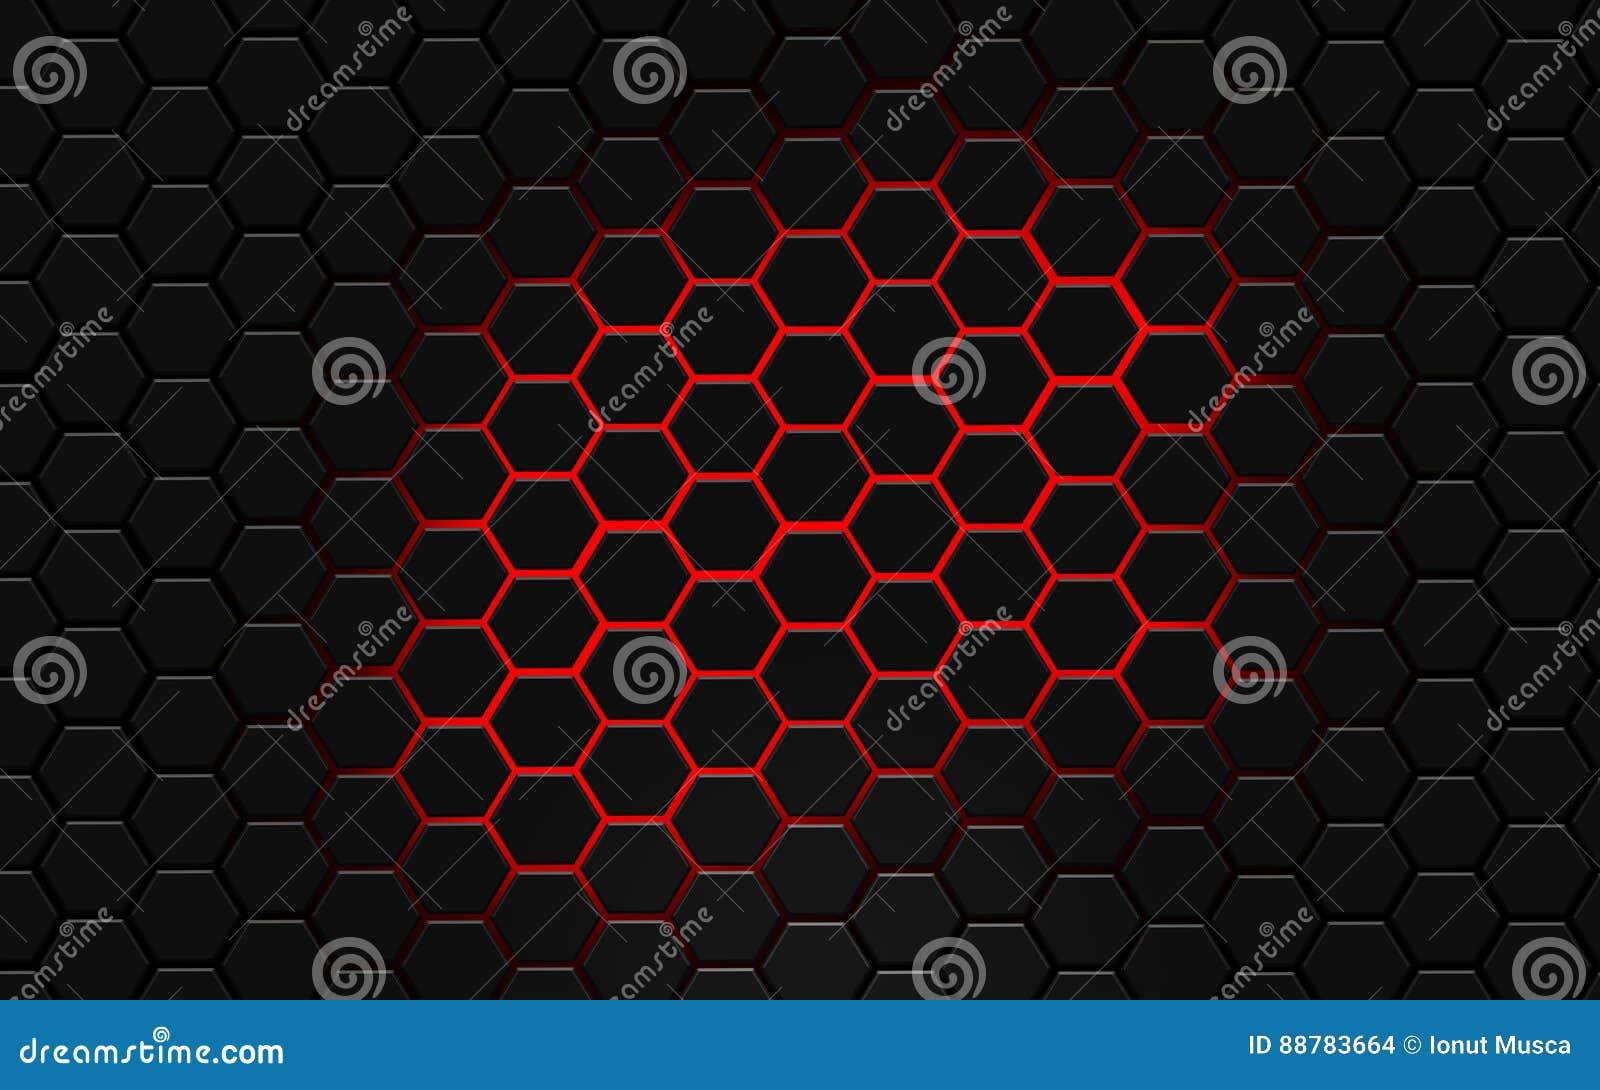 modern red pattern wallpaper labzada wallpaper